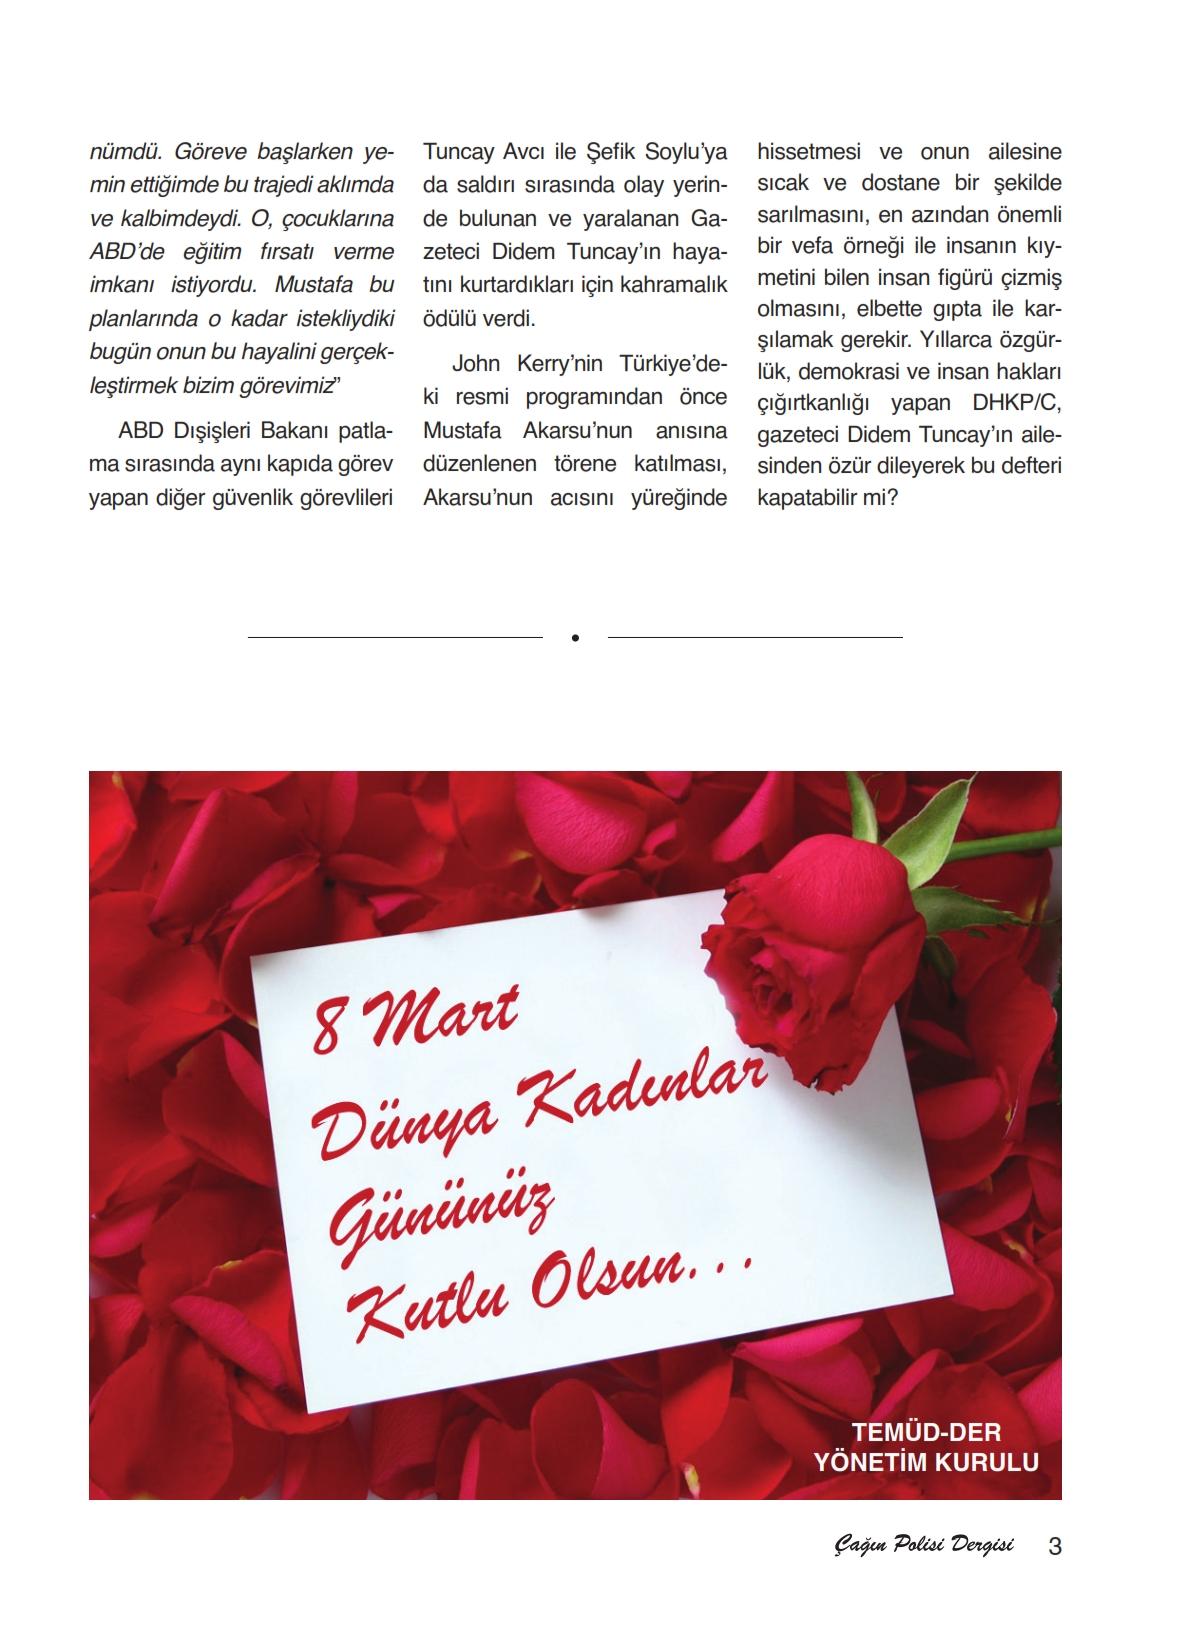 polis_dergi_mart_2013 (1)_003